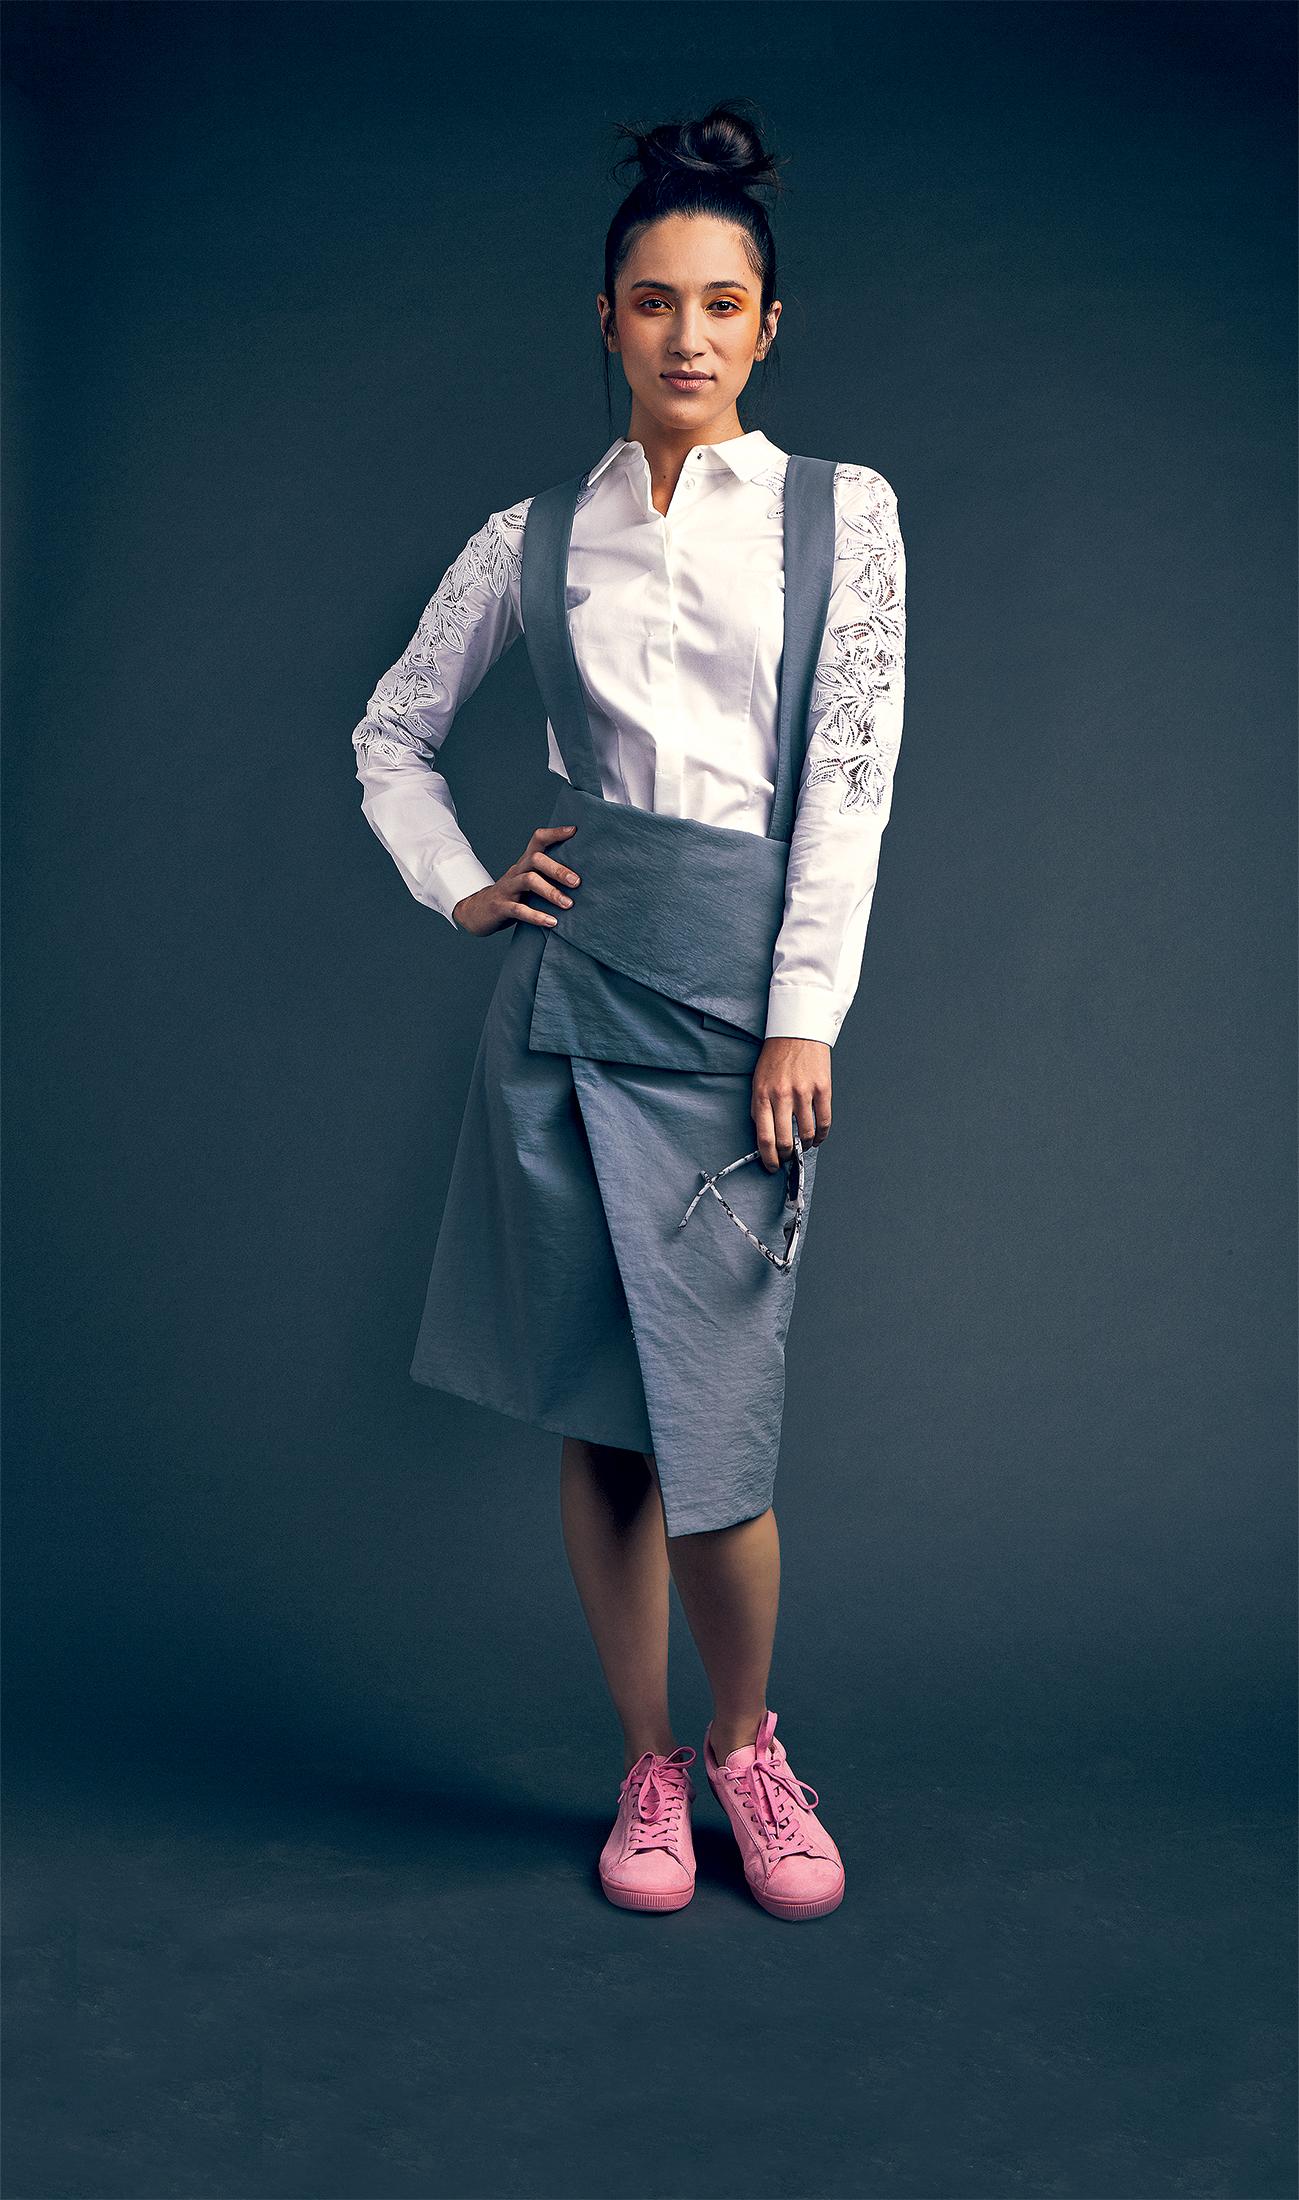 Elie Tahari white blouse, $161 at Saks; gray dungaree dress, $175 at Cos; pink sneakers, $150 at Puma.